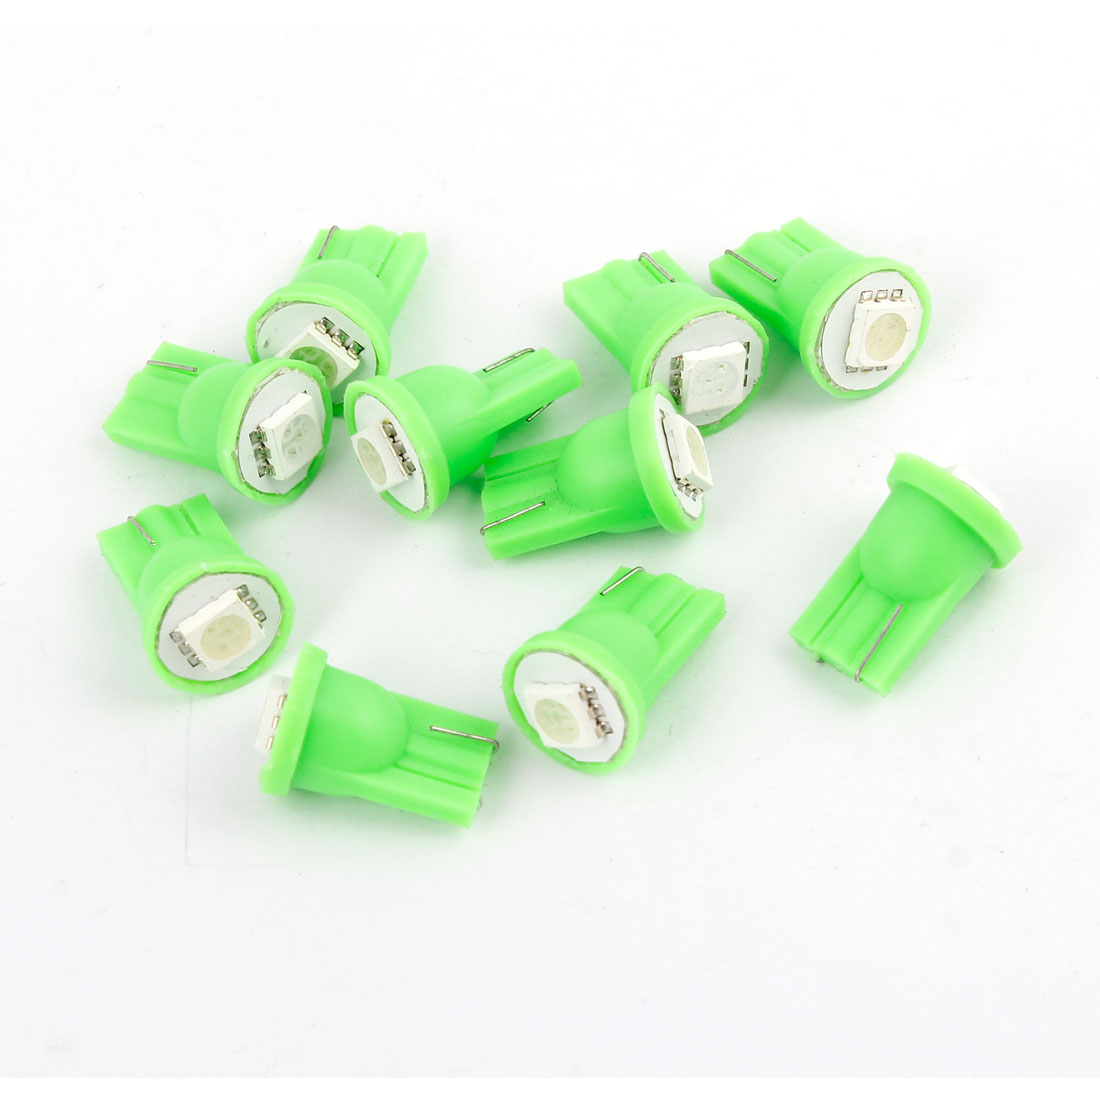 Vehicls T10 904 168 W5W Green 5050 SMD  Dashboard Light lamp Bulbs 10 Pcs